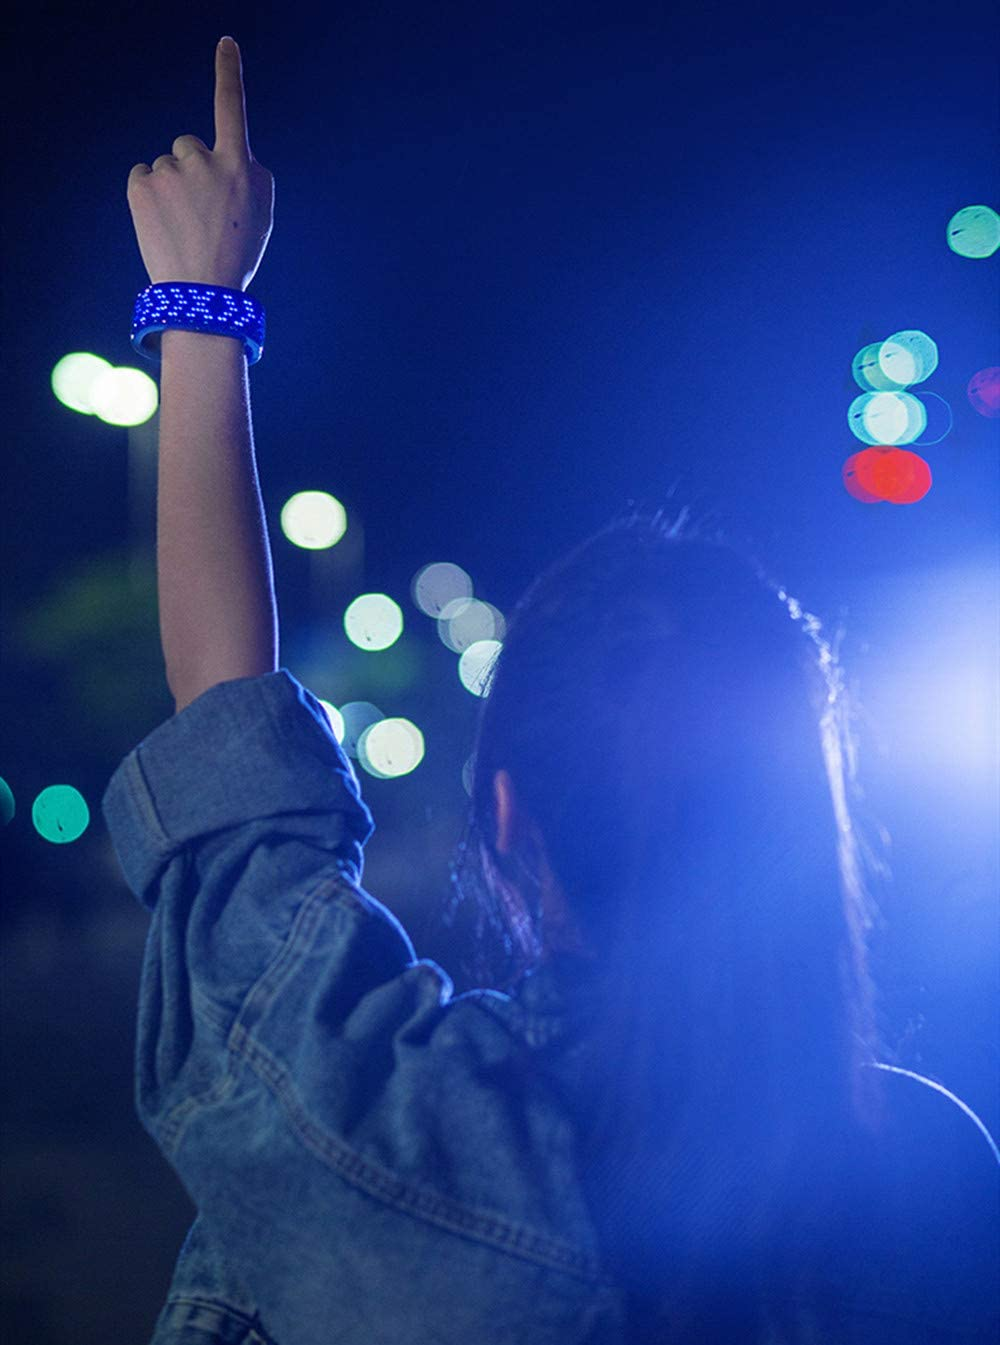 Glow Wristbands AINSKO LED Customizable Bluetooth Glowing Bracelet Light Up Glowing Slap Bracelet Night Safety Wristband Reflective Gear LED Bluetooth APP Control Slap Bracelet